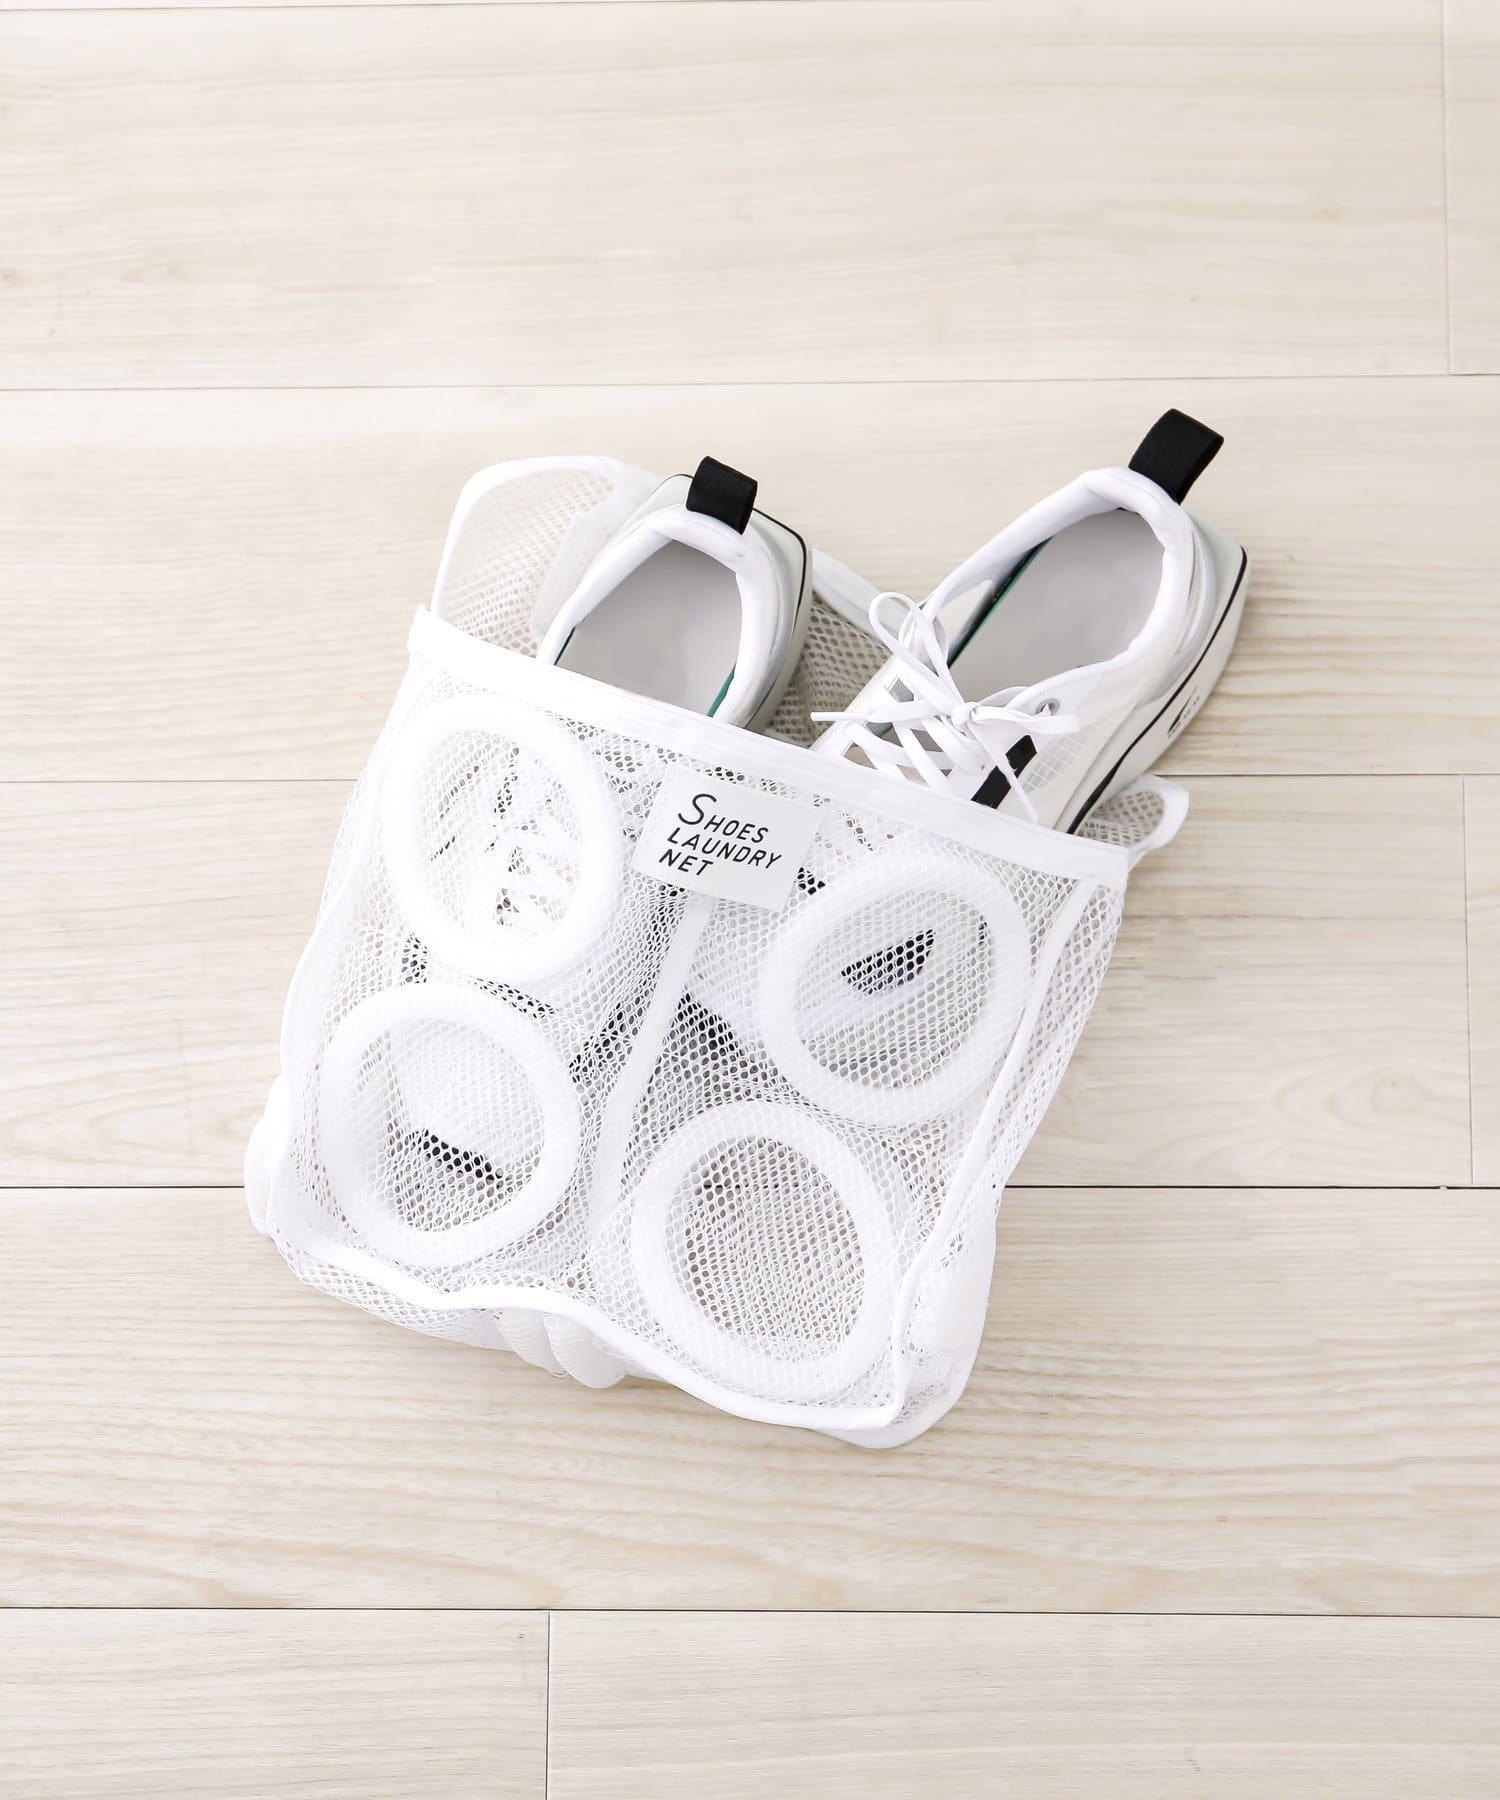 3COINS(スリーコインズ) 【お洗濯をより快適に】シューズランドリーネット